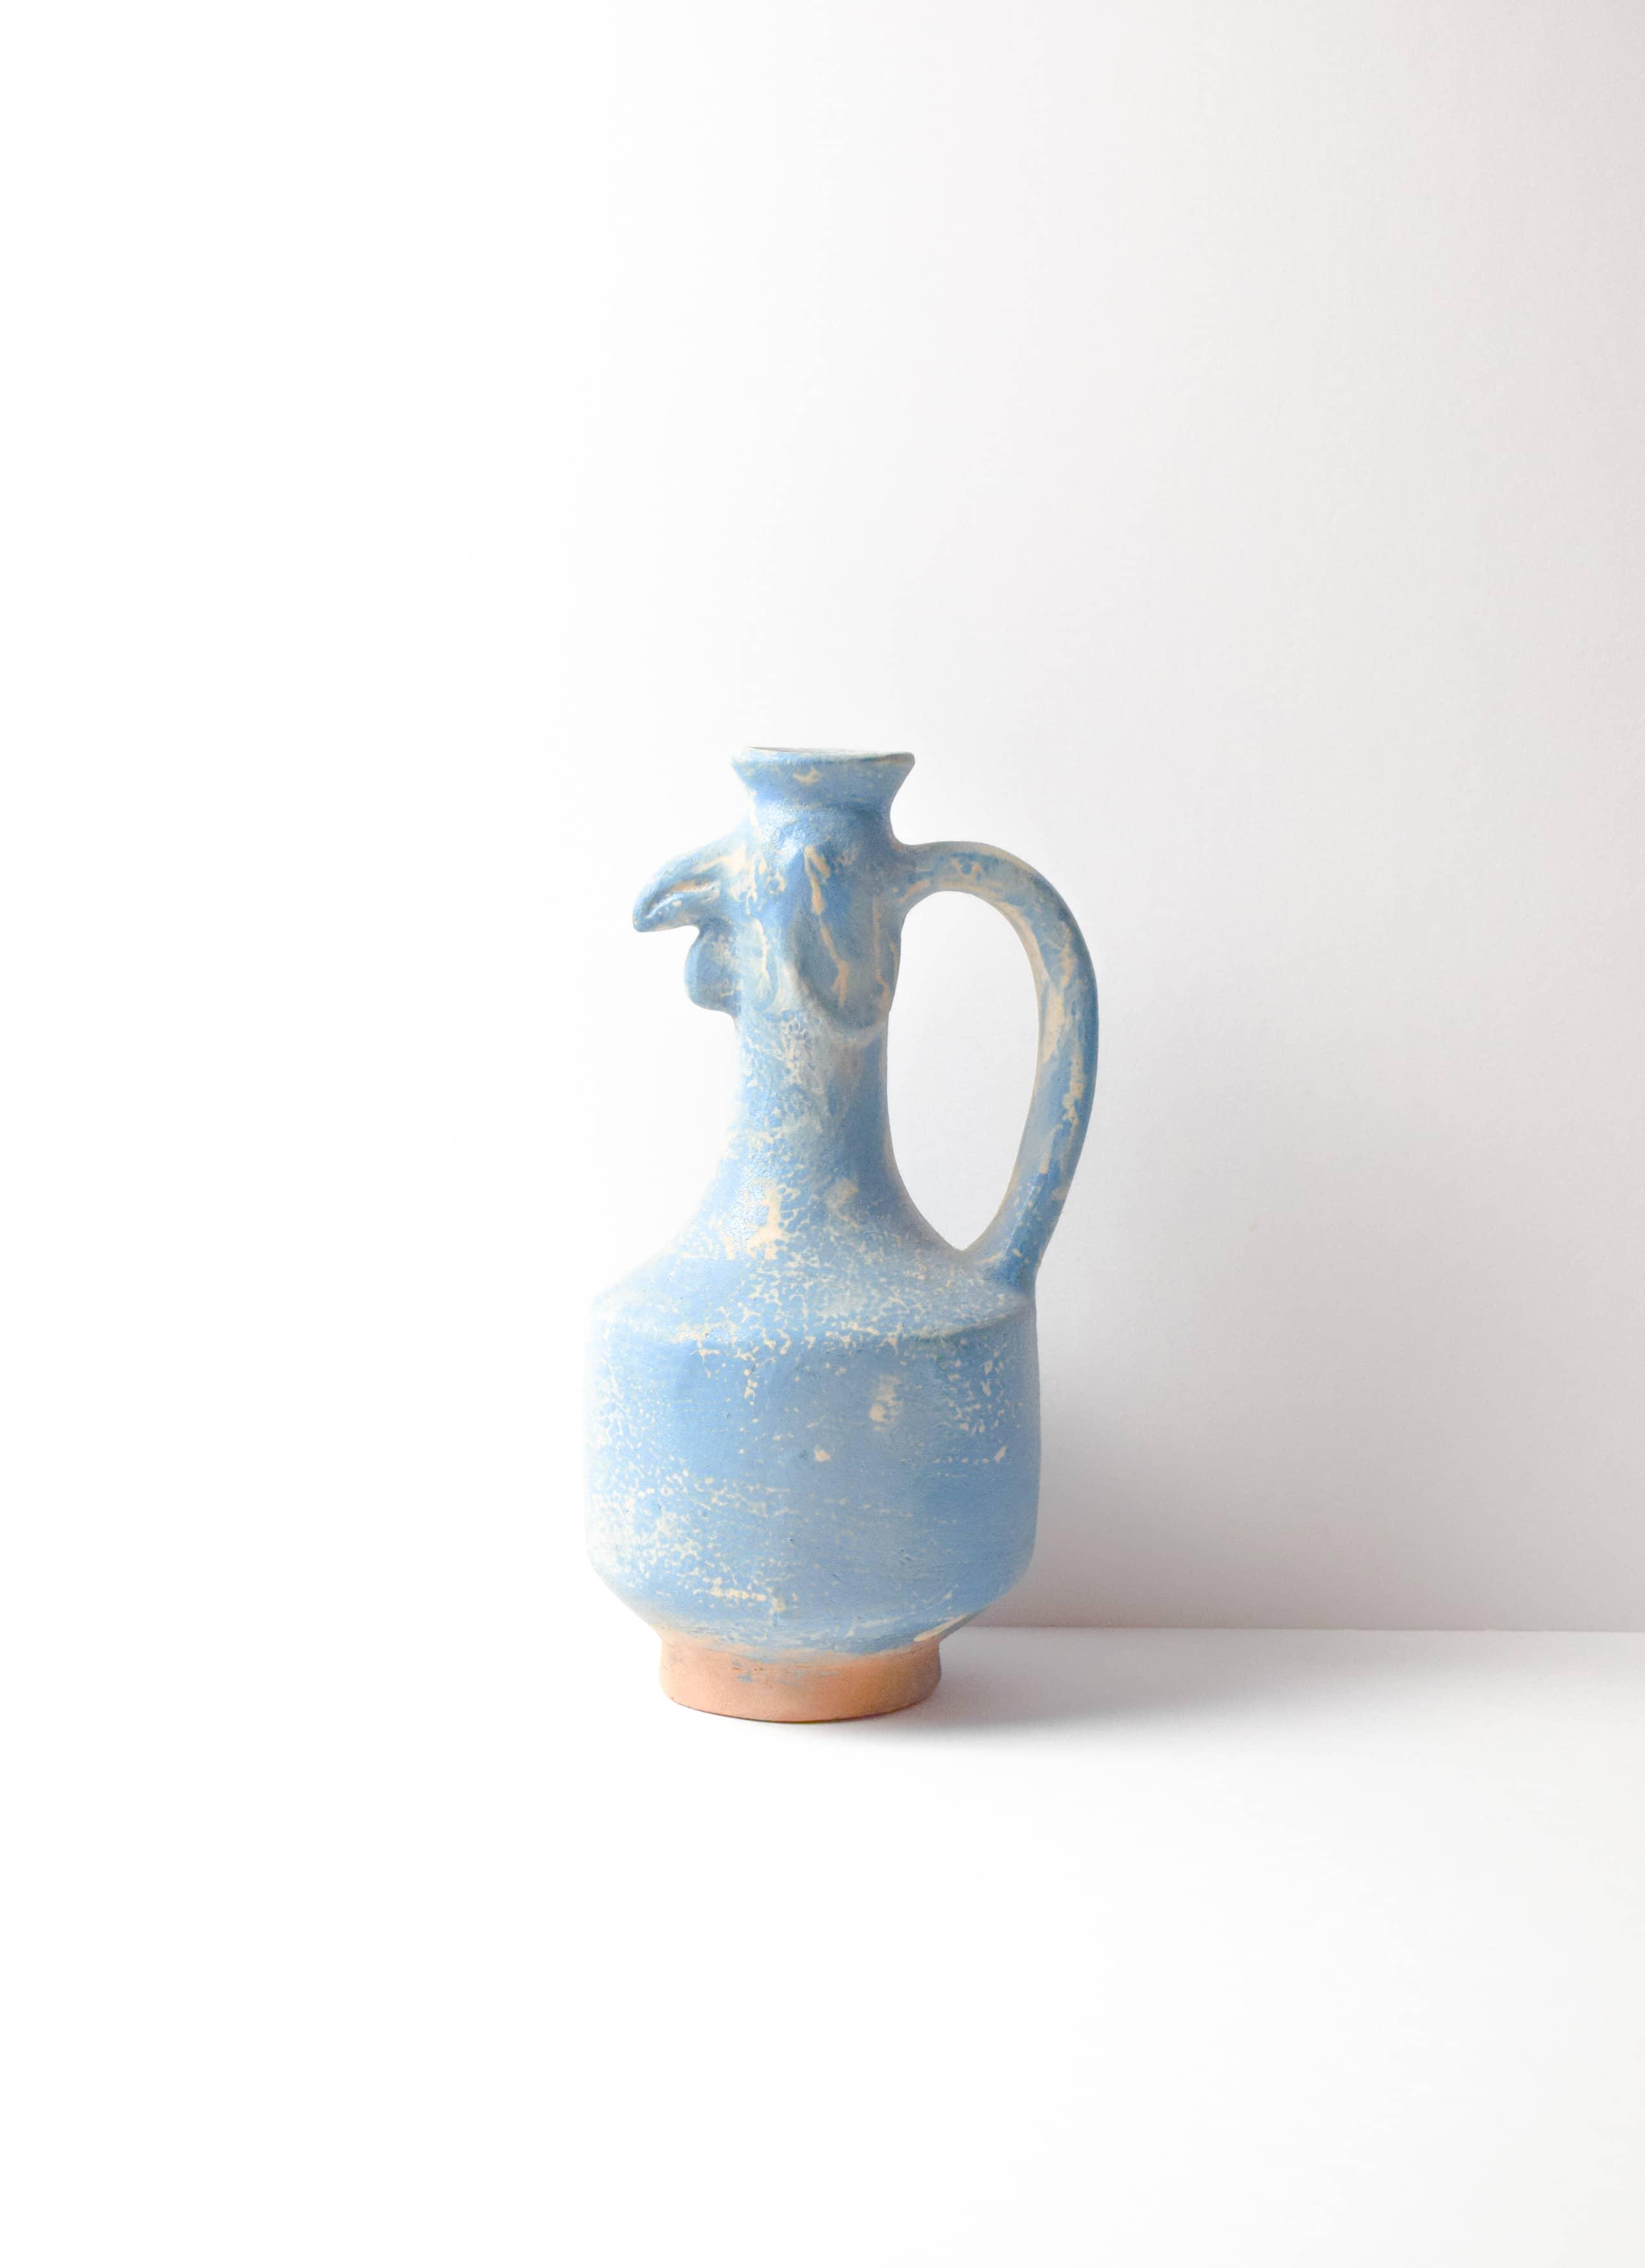 La Soufflerie - Le Coq - Decorative Vase - Terracotta